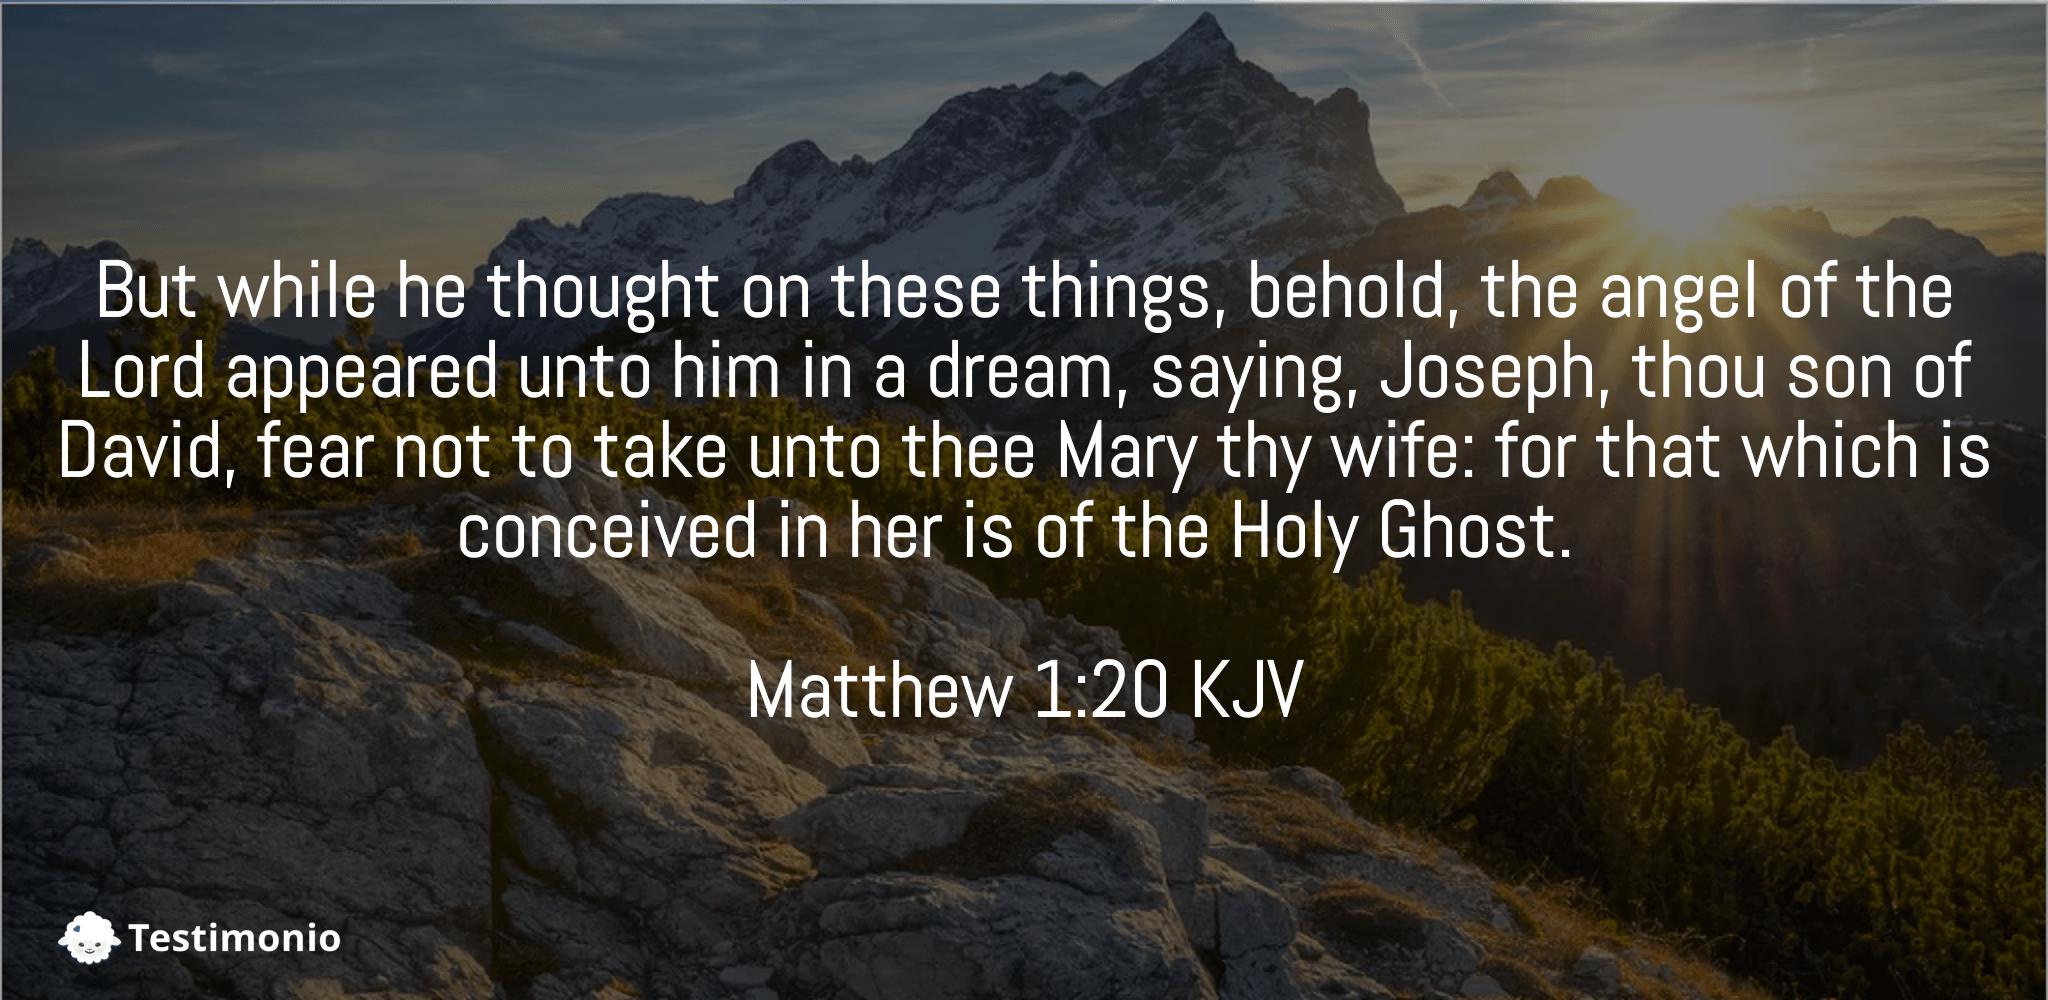 Matthew 1:20